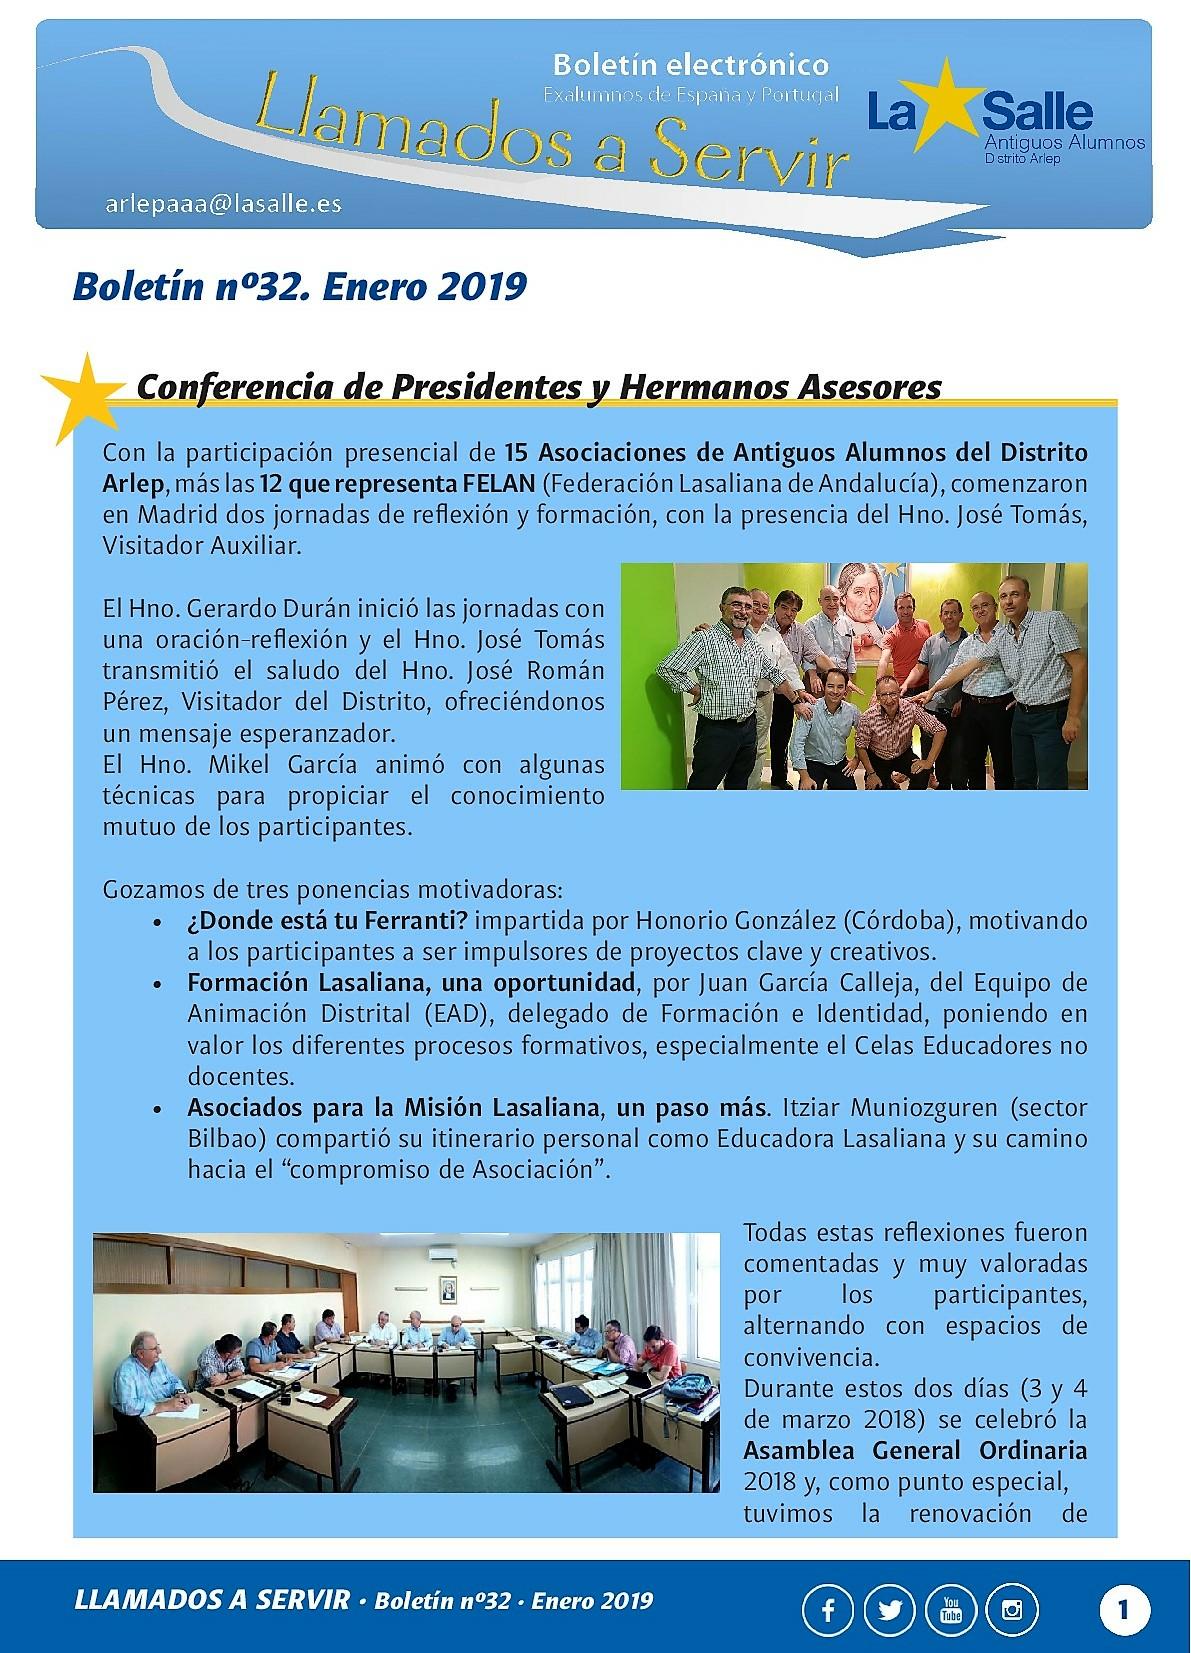 BOLETIN No32 DE LA COORDINADORA